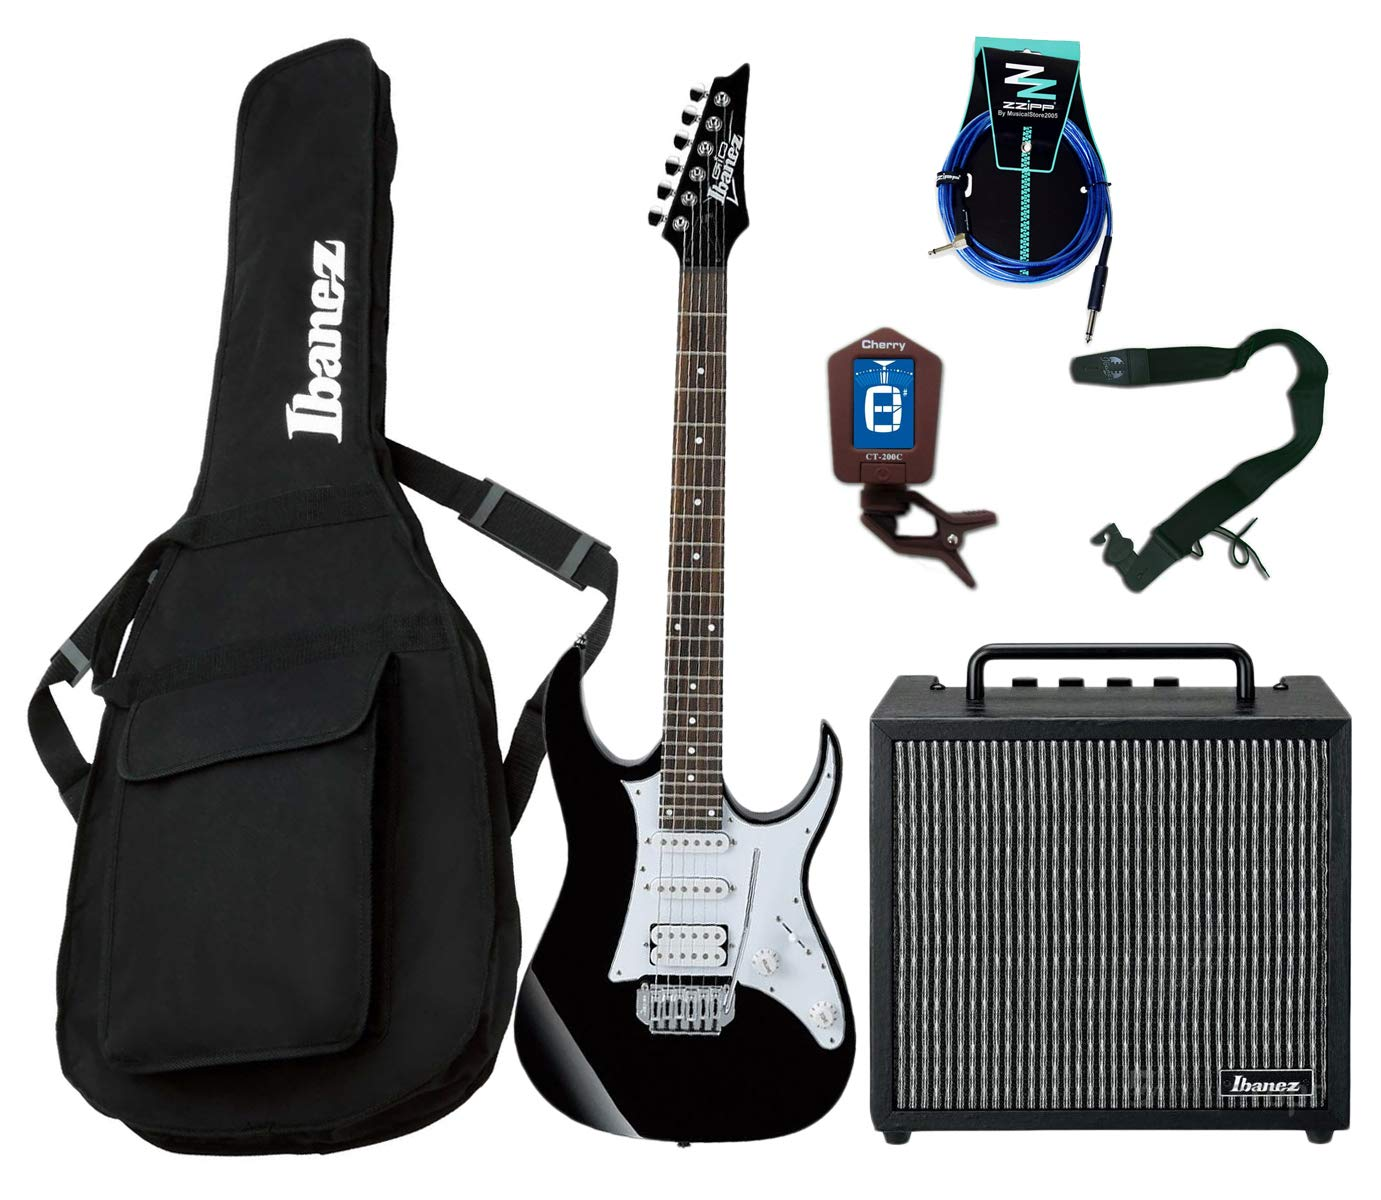 Guitar Starter Pack Ibanez Guitarra Eléctrica Entry Level/Combo 10 W/accesorios: Amazon.es: Instrumentos musicales